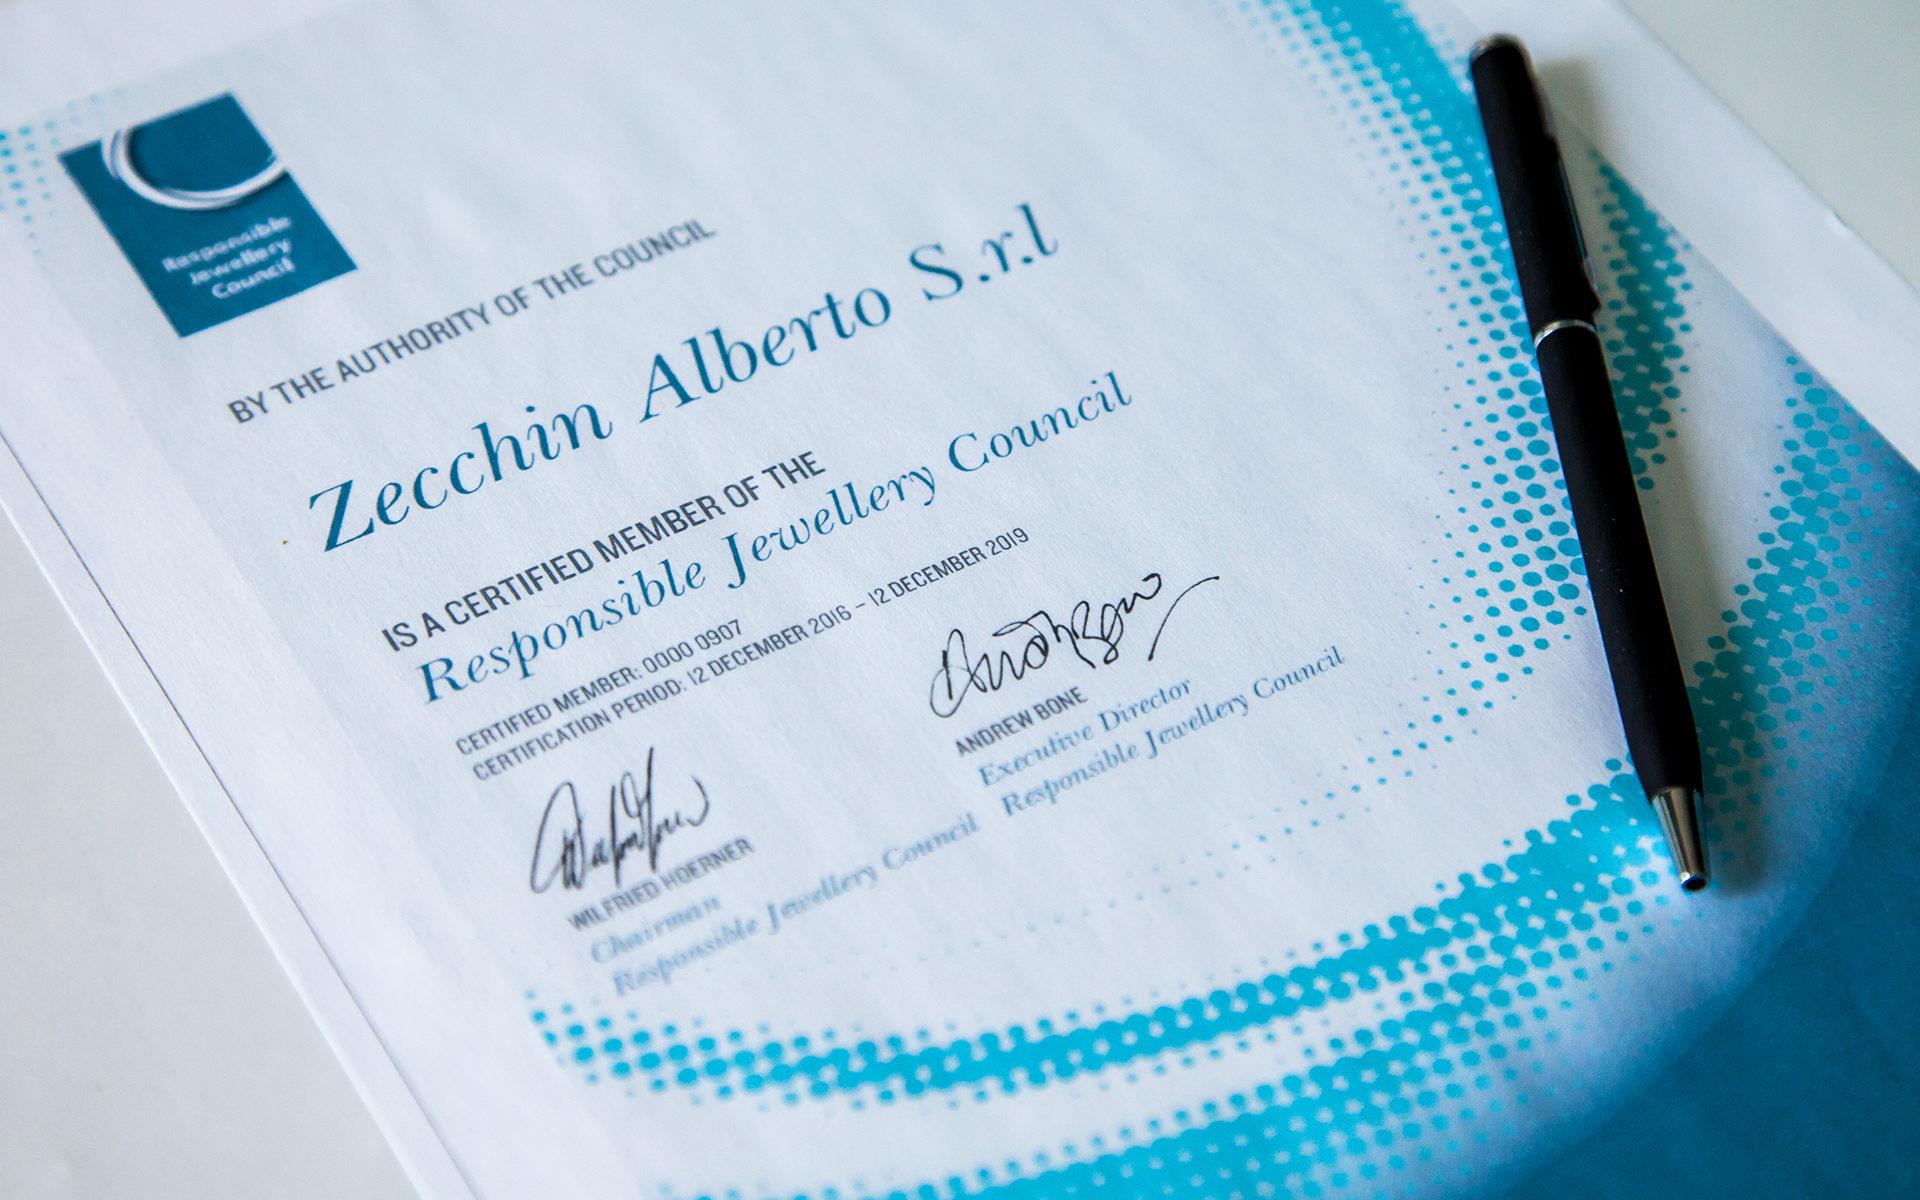 ZECCHIN ALBERTO3